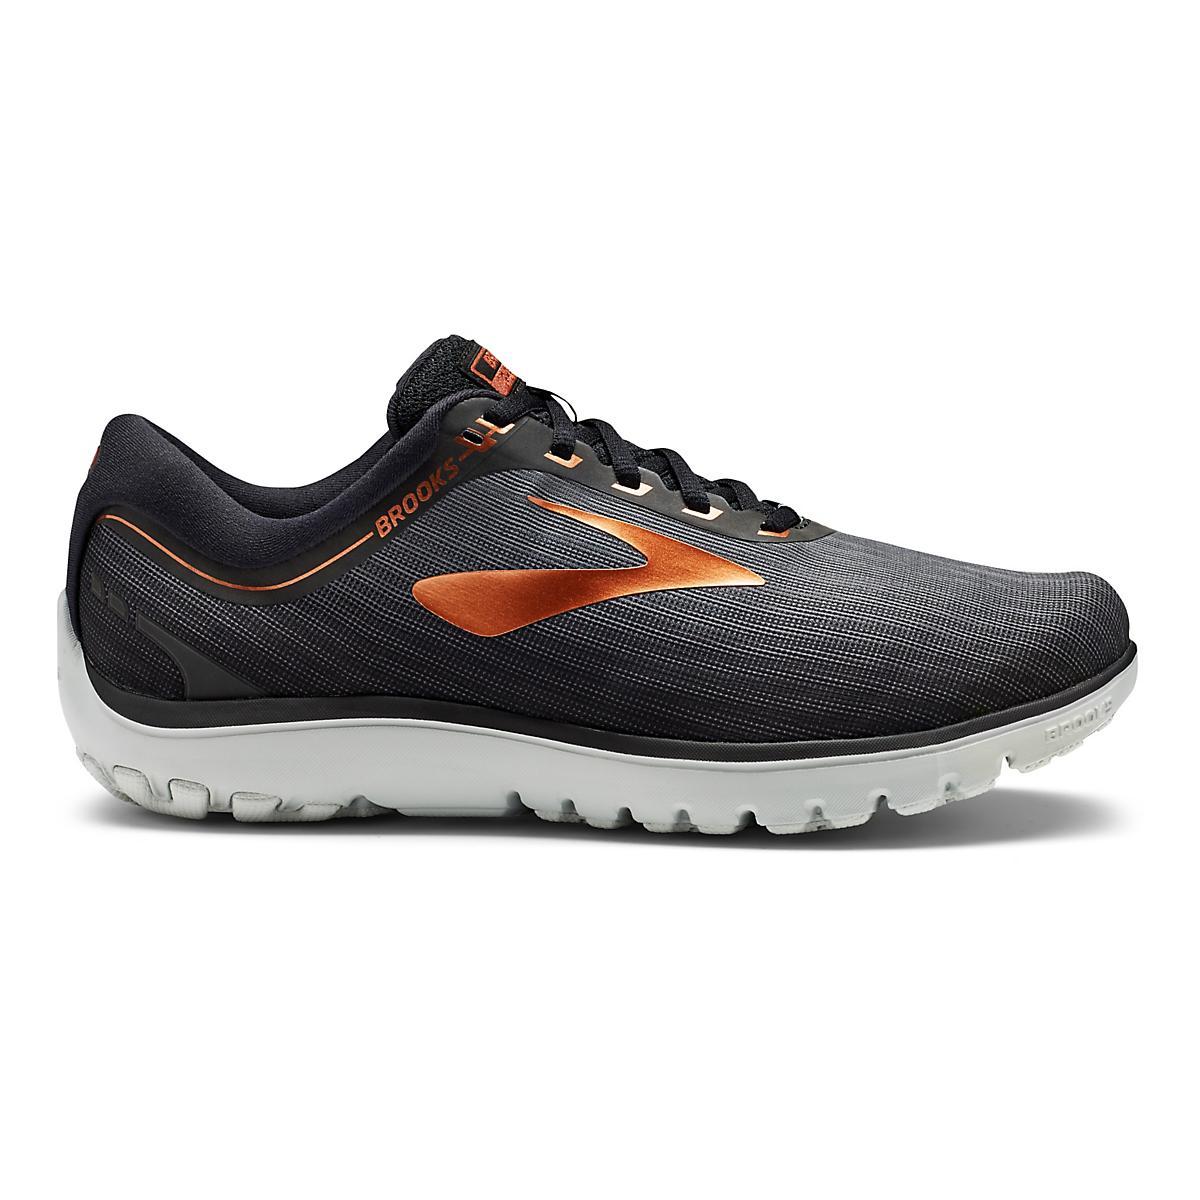 b213cdd6807 Mens Brooks PureFlow 7 Running Shoe at Road Runner Sports